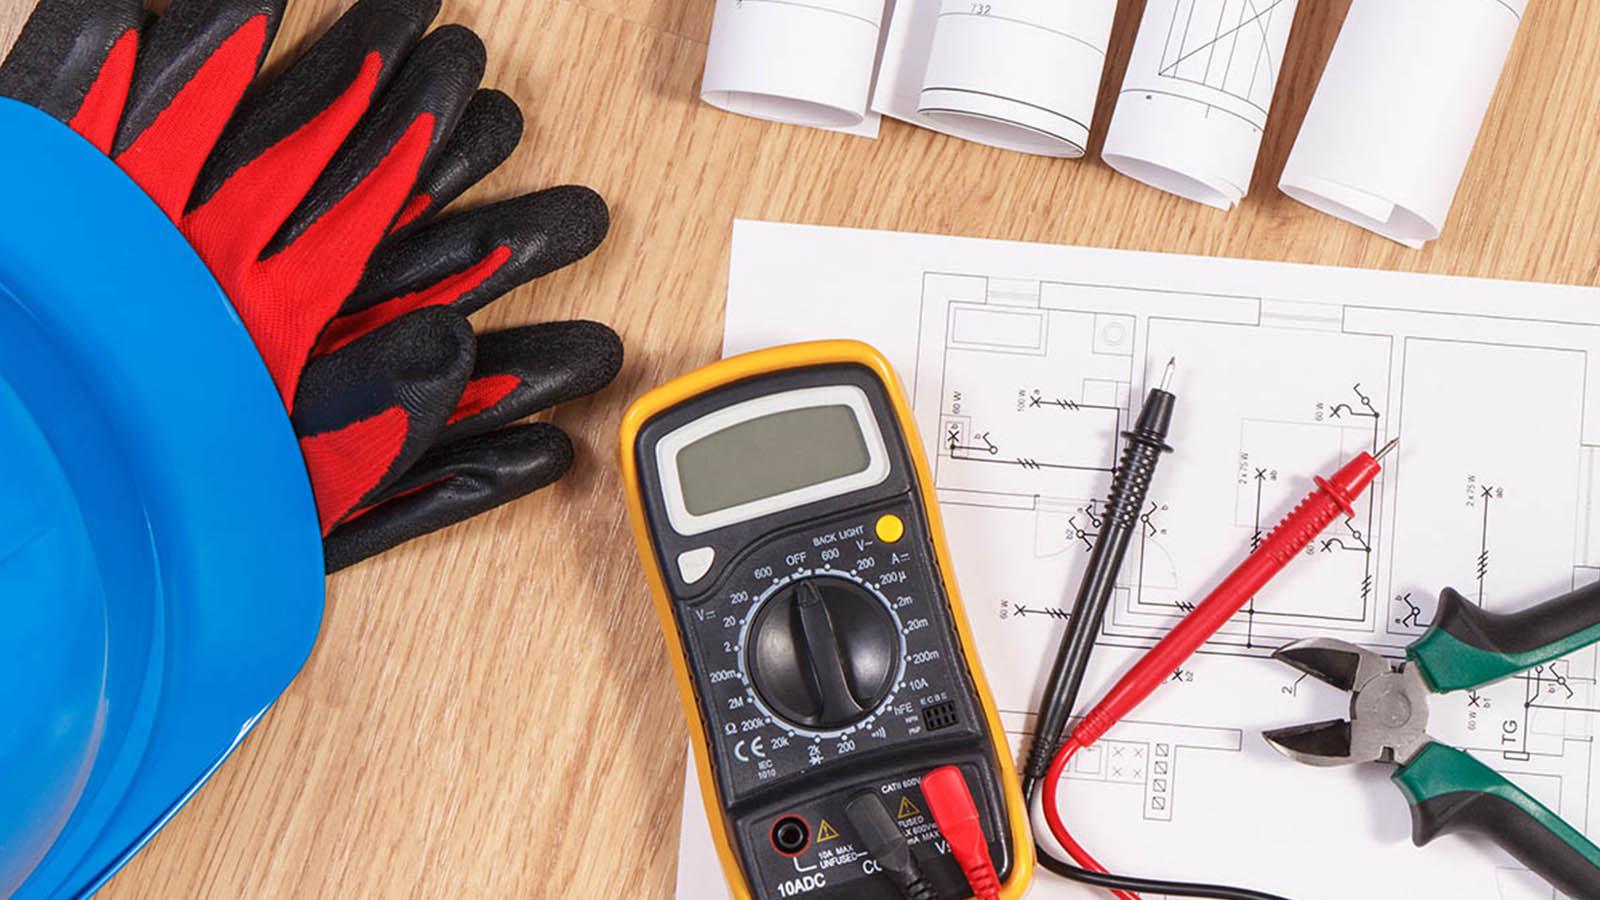 SmartBrains-electrical-drawings-schematic-workshop-online-training-certification-course-Noida-Delhi-Mumbai-Chennai-Pune-Dehradun-Sudan-South-Africa-Dubai